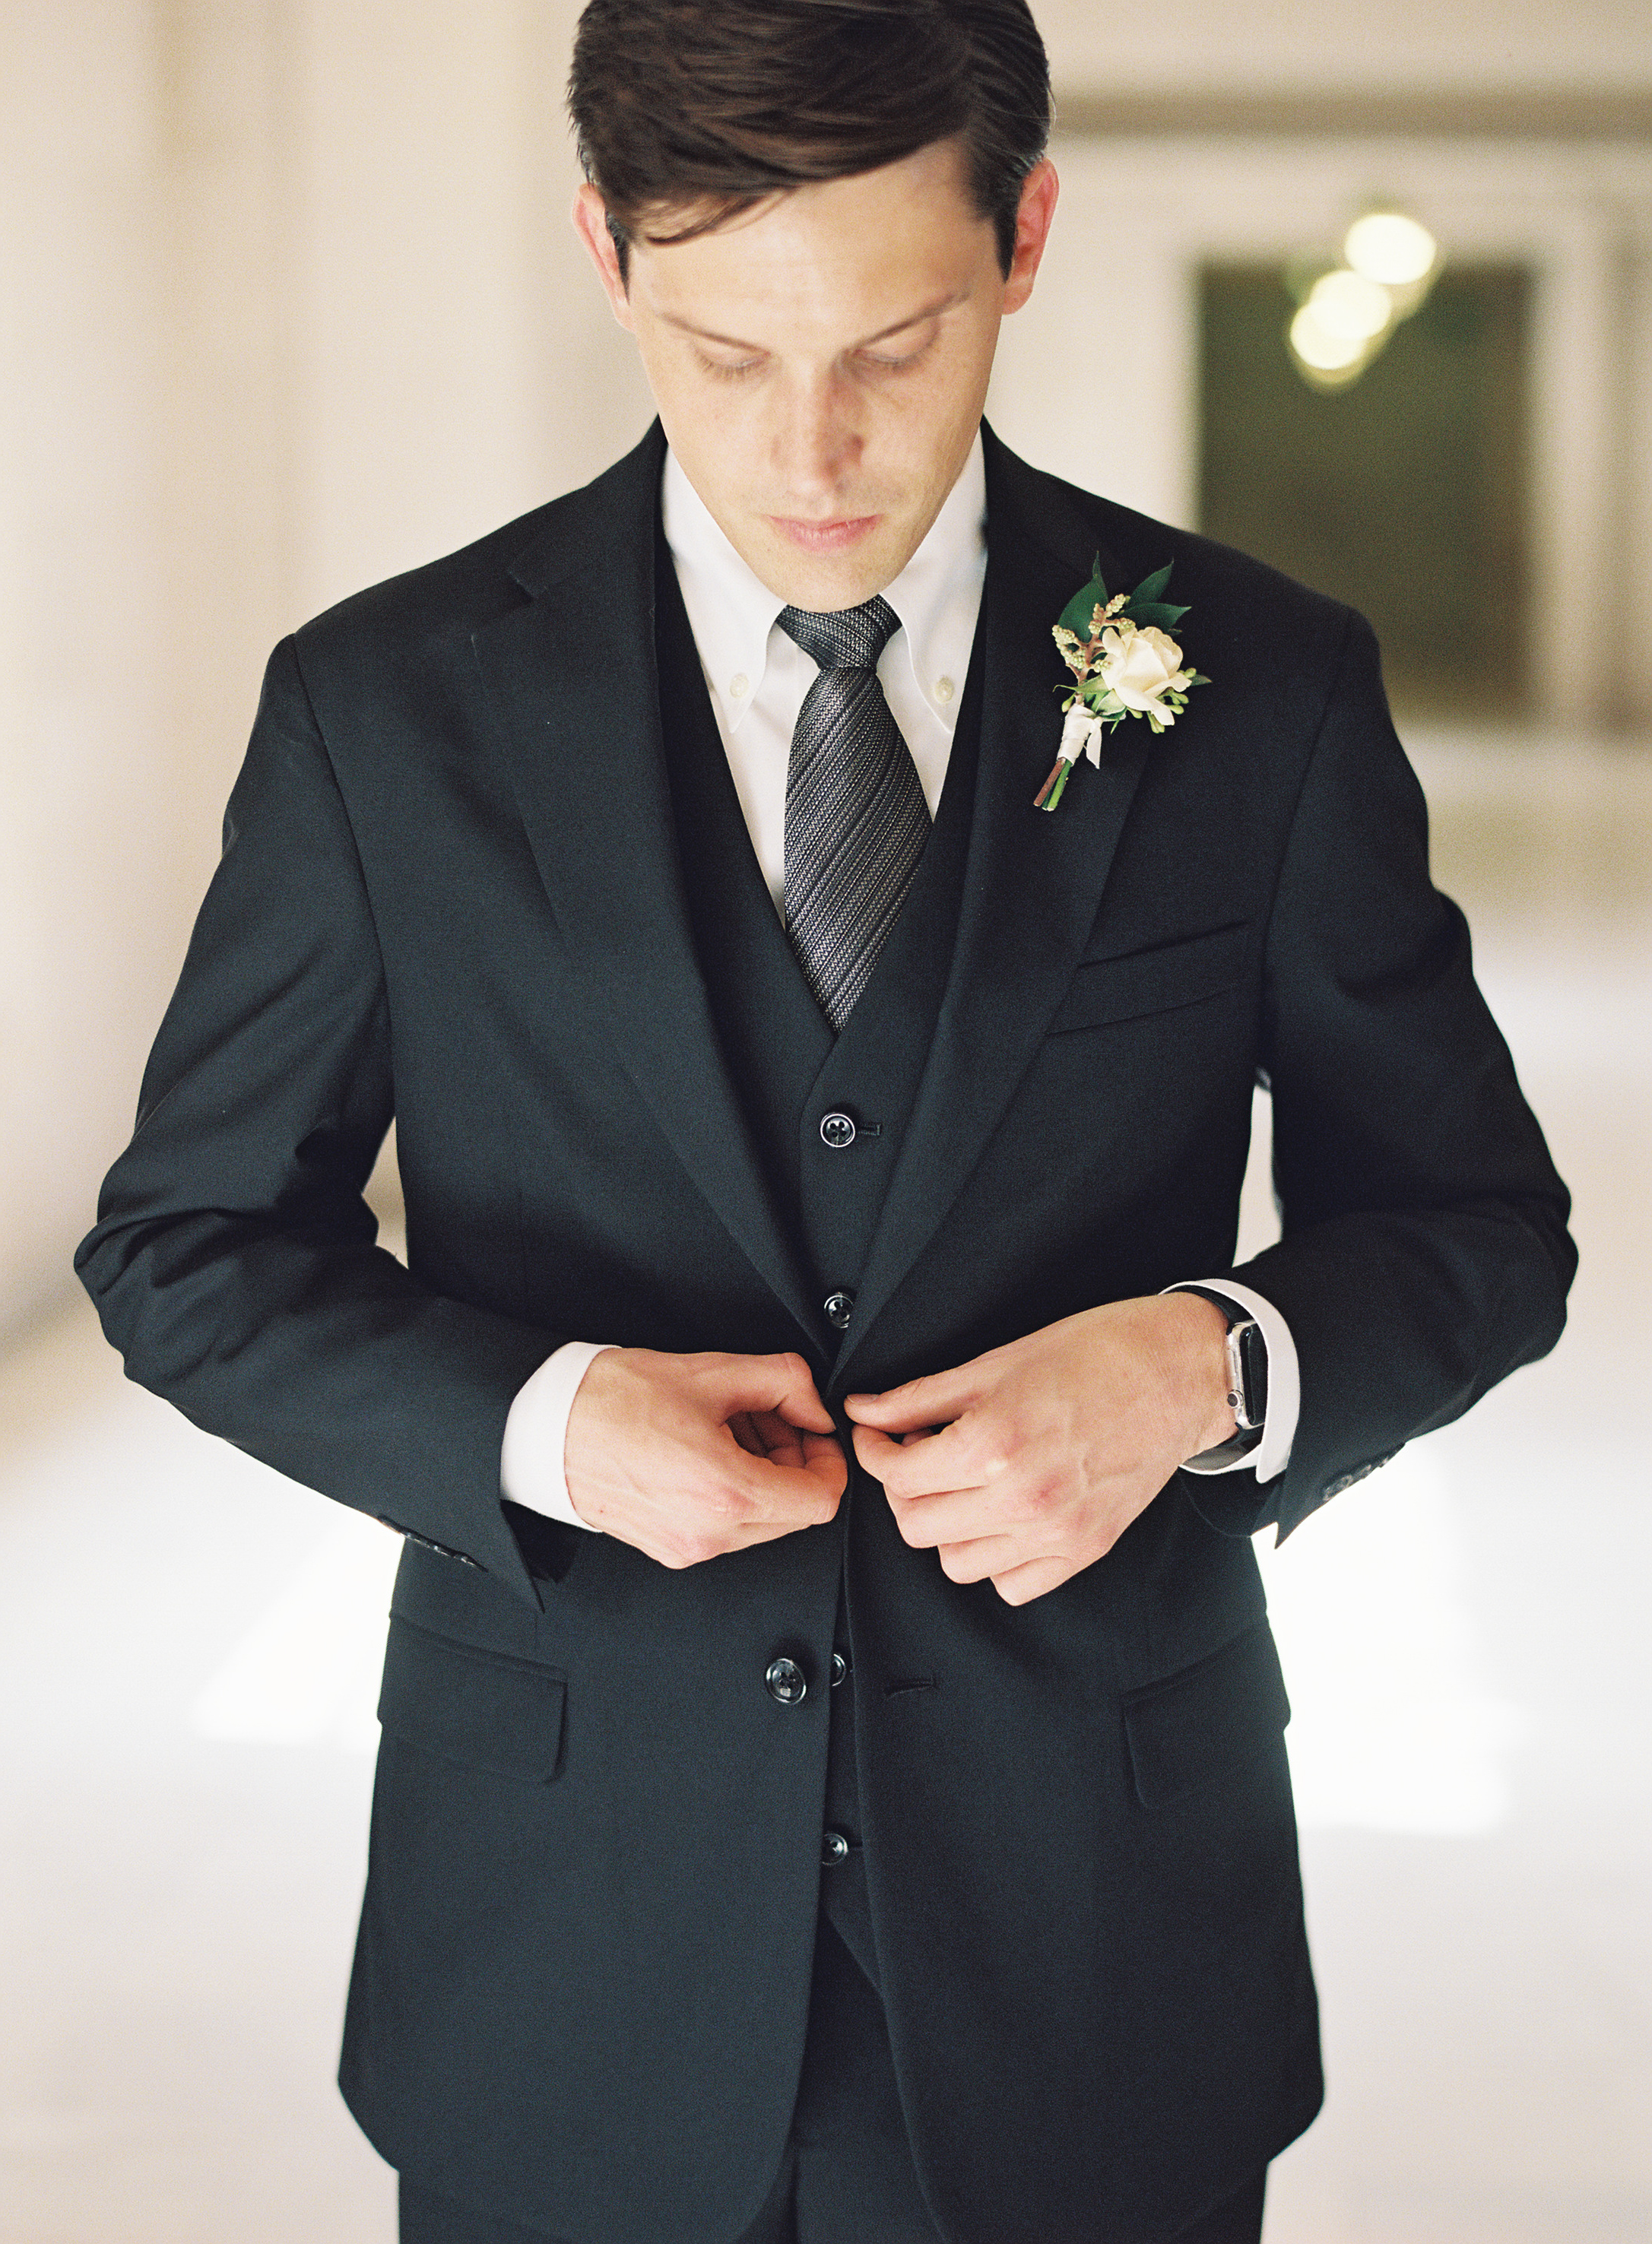 Meghan Mehan Photography - California Wedding Photographer | San Francisco City Hall Wedding 027.jpg